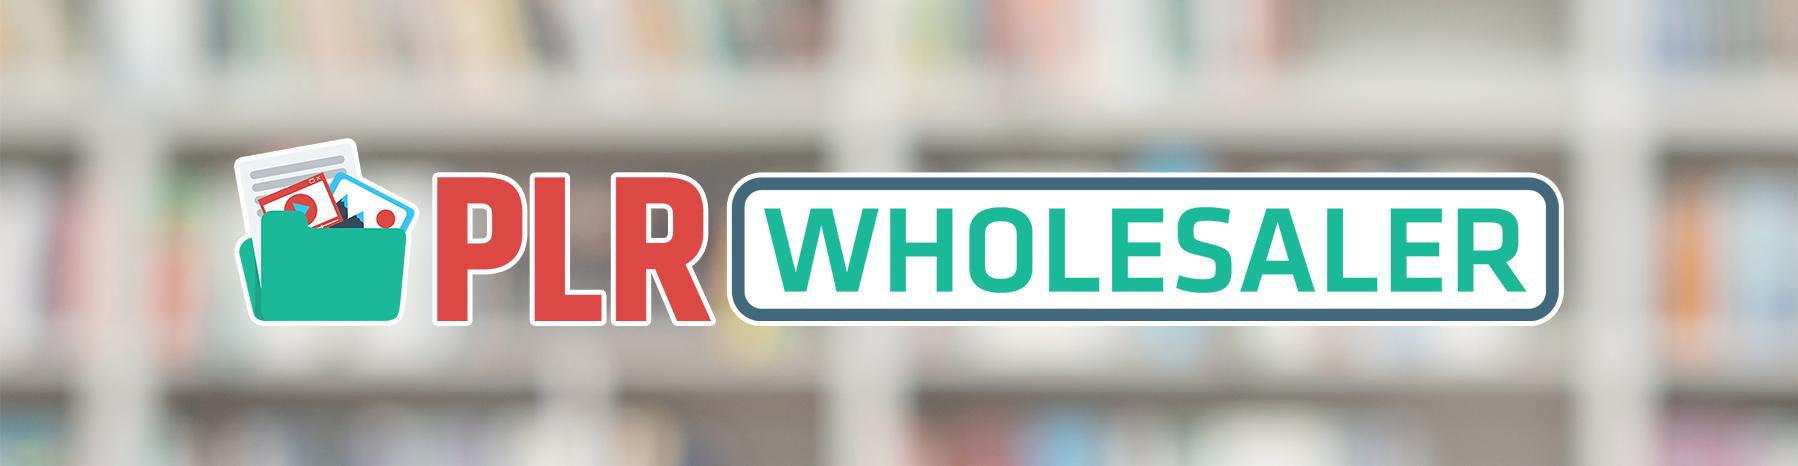 PLR Wholesaler header image